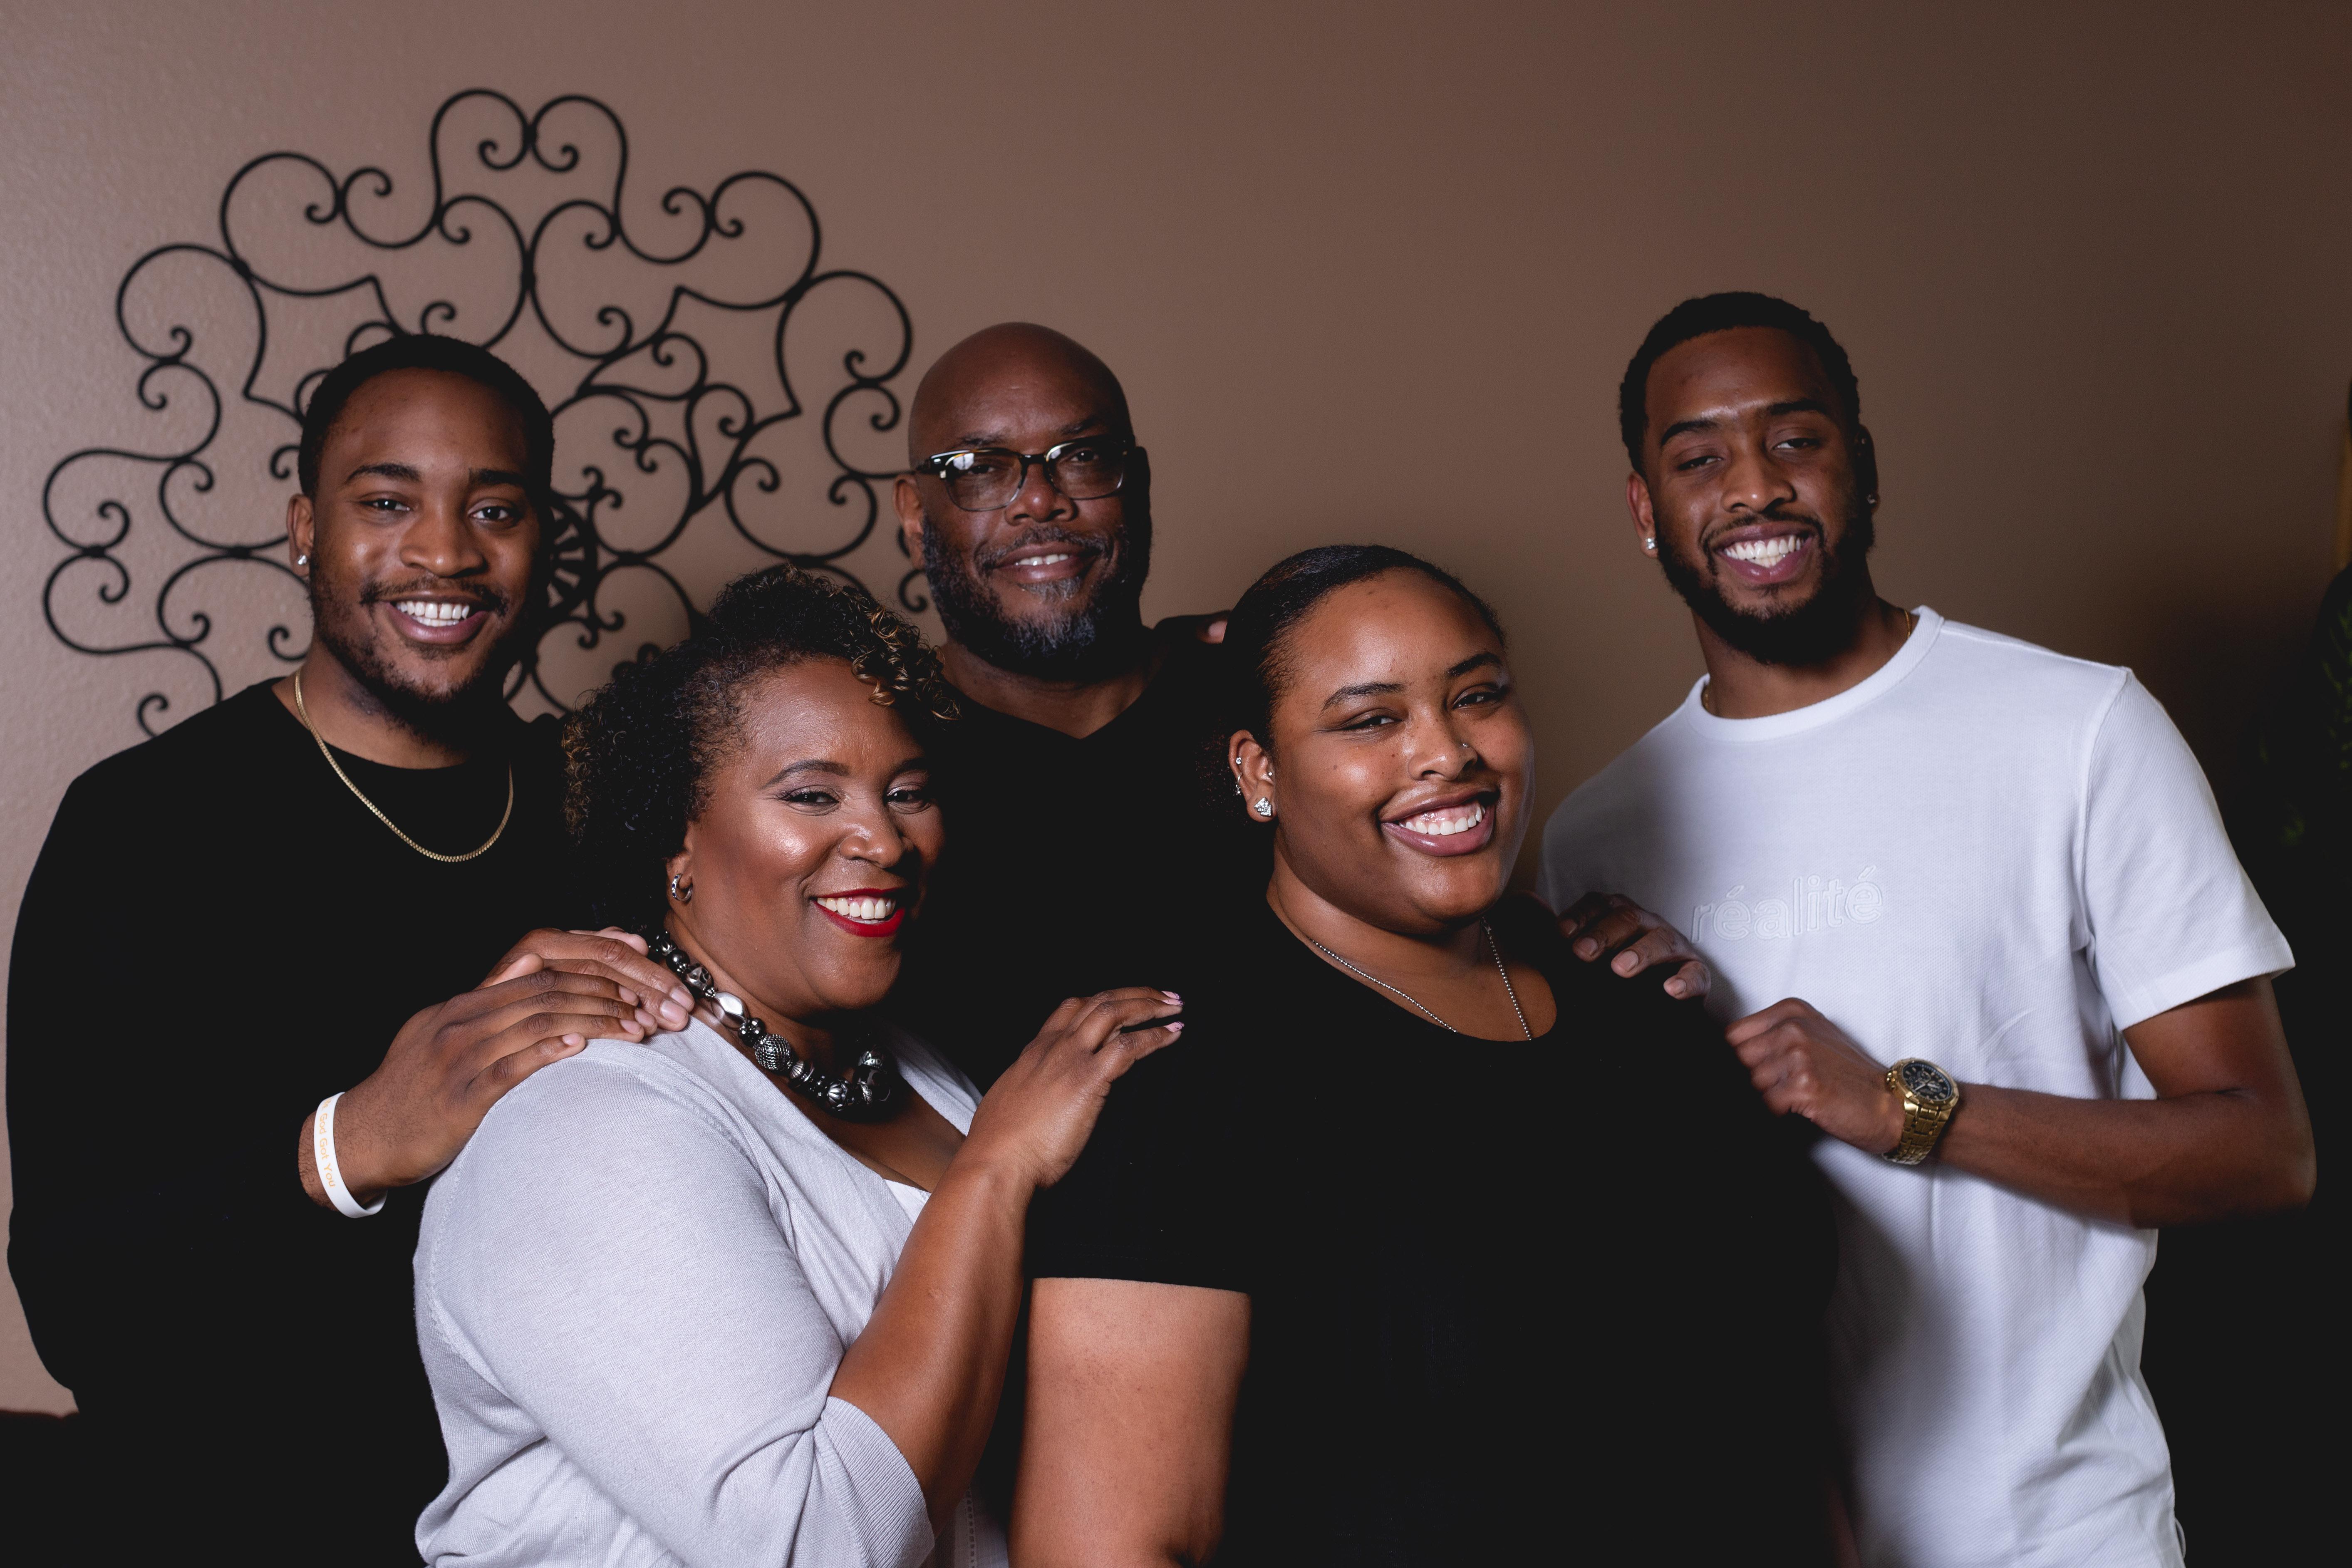 A portrait of Denver School Board candidate Michelle Quattlebaum and four family members.